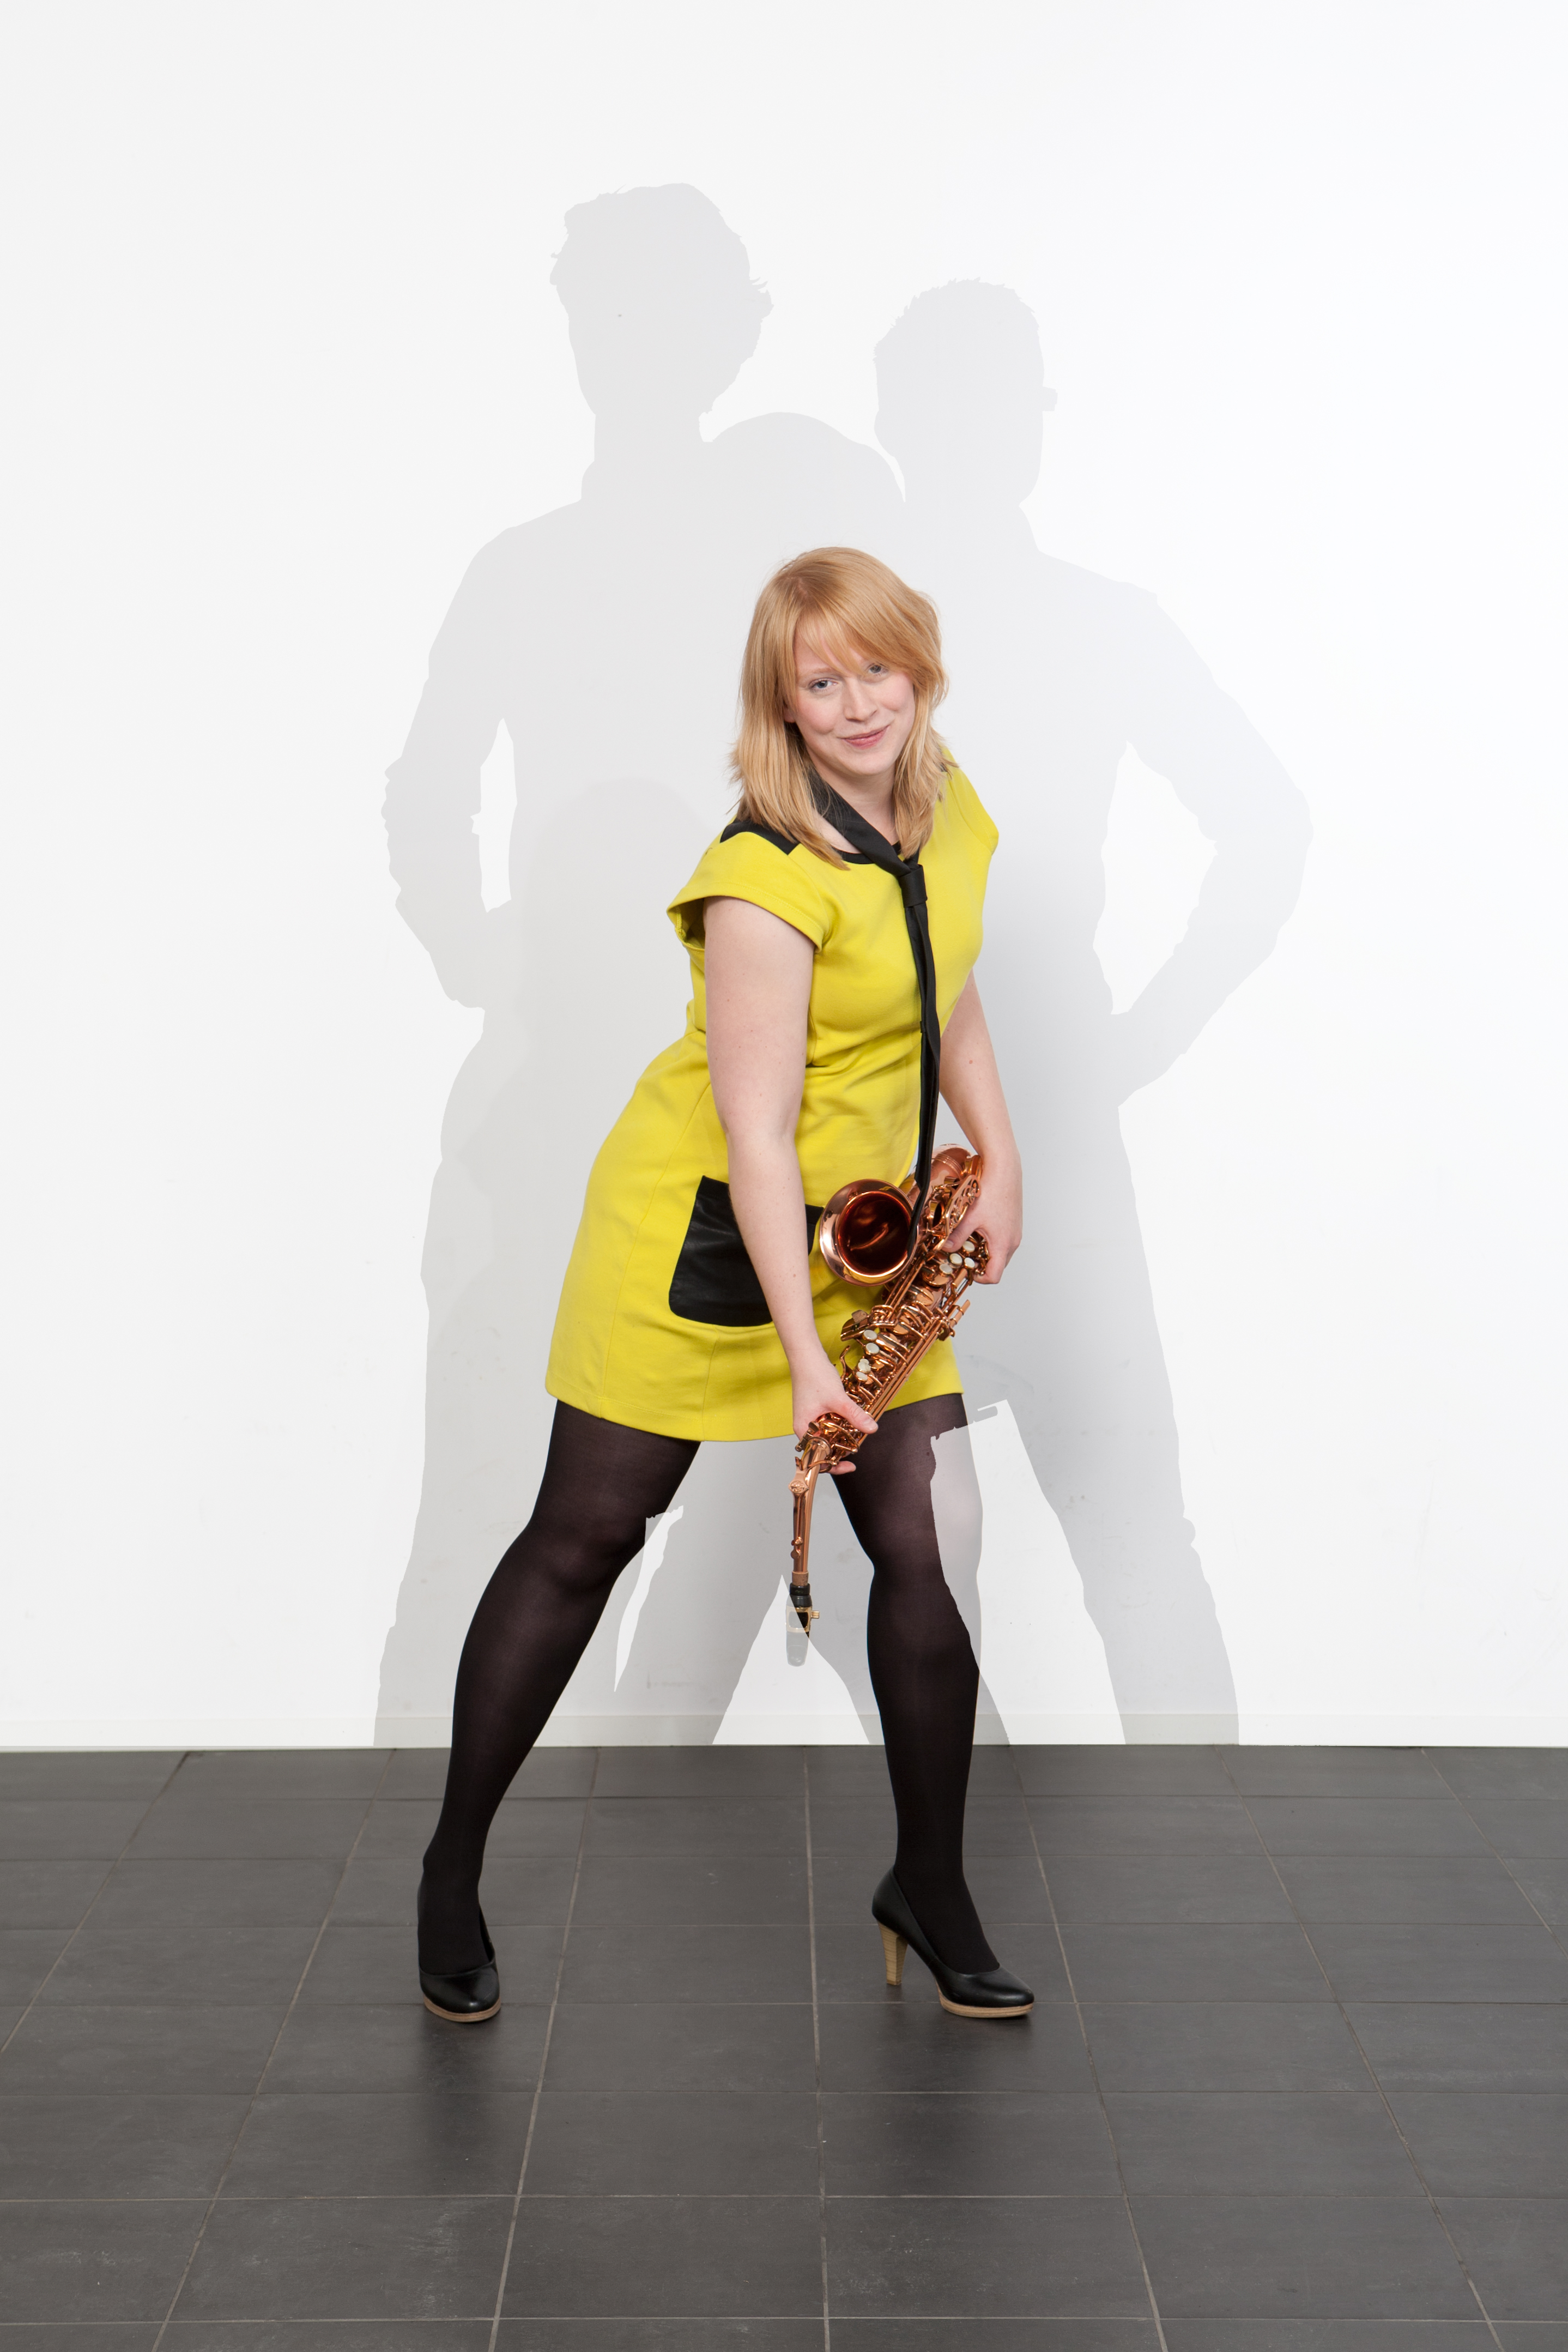 Annelies Vrieswijk